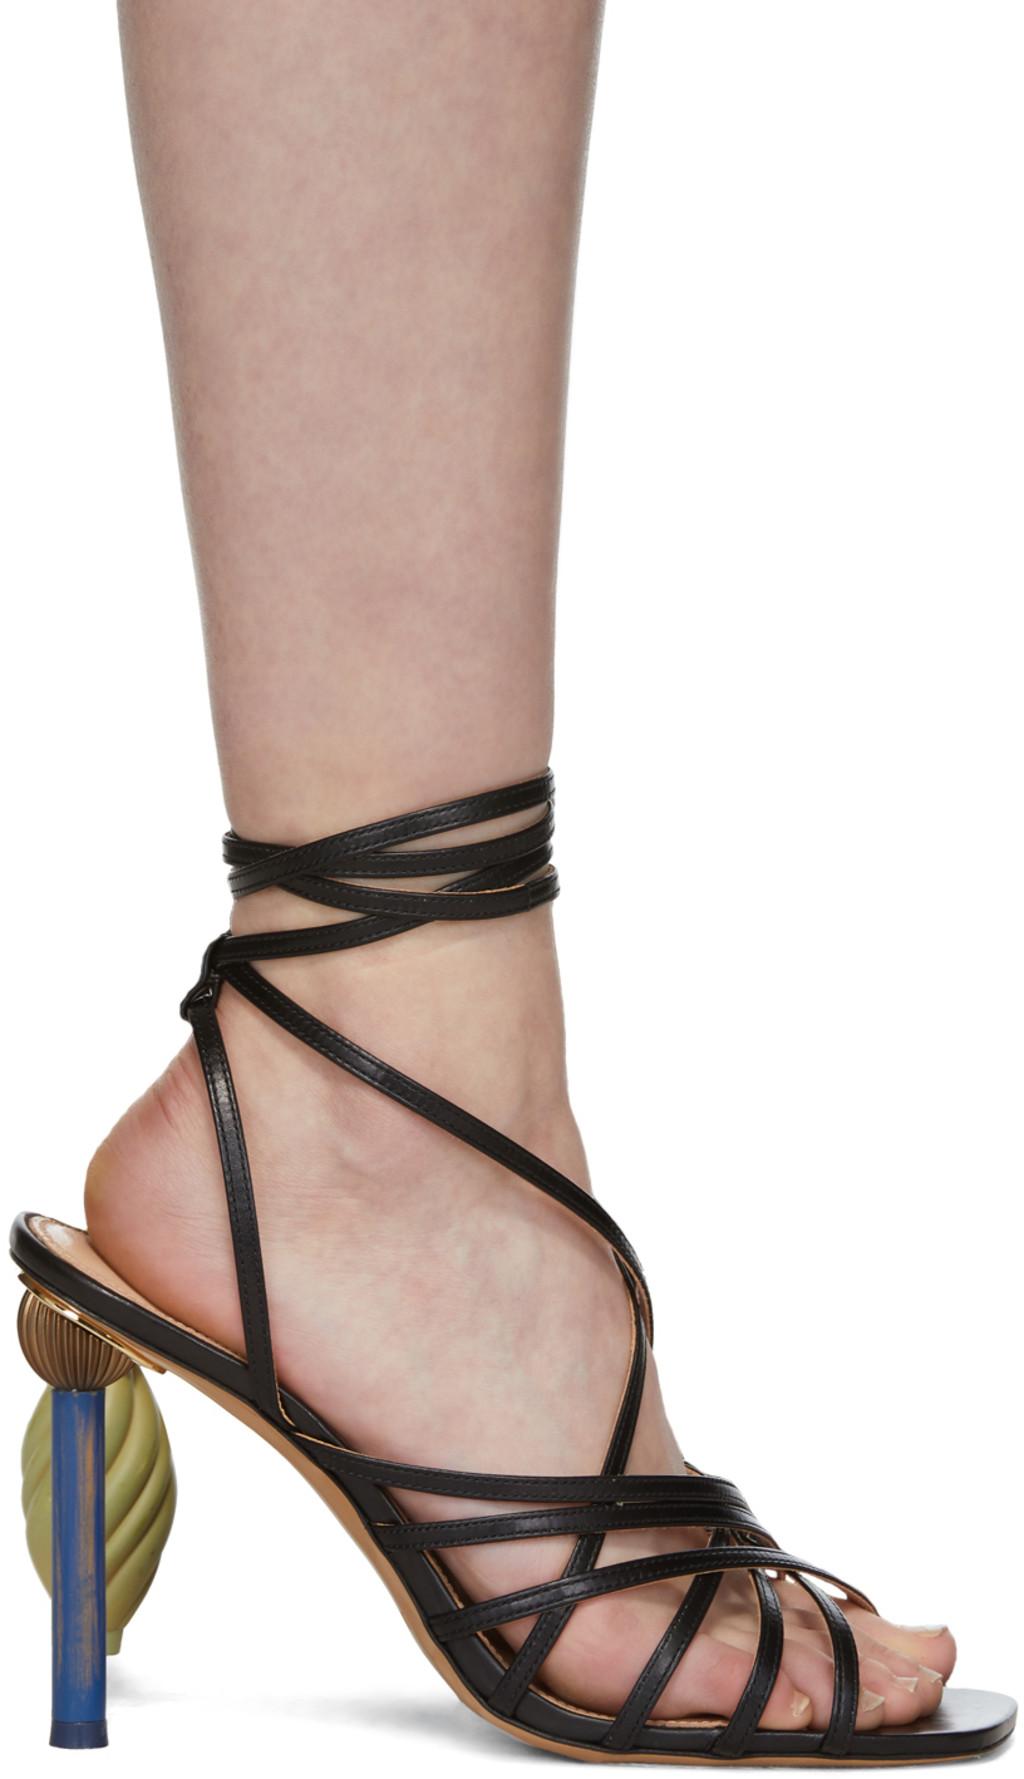 310a1fe437 Designer sandals for Women   SSENSE